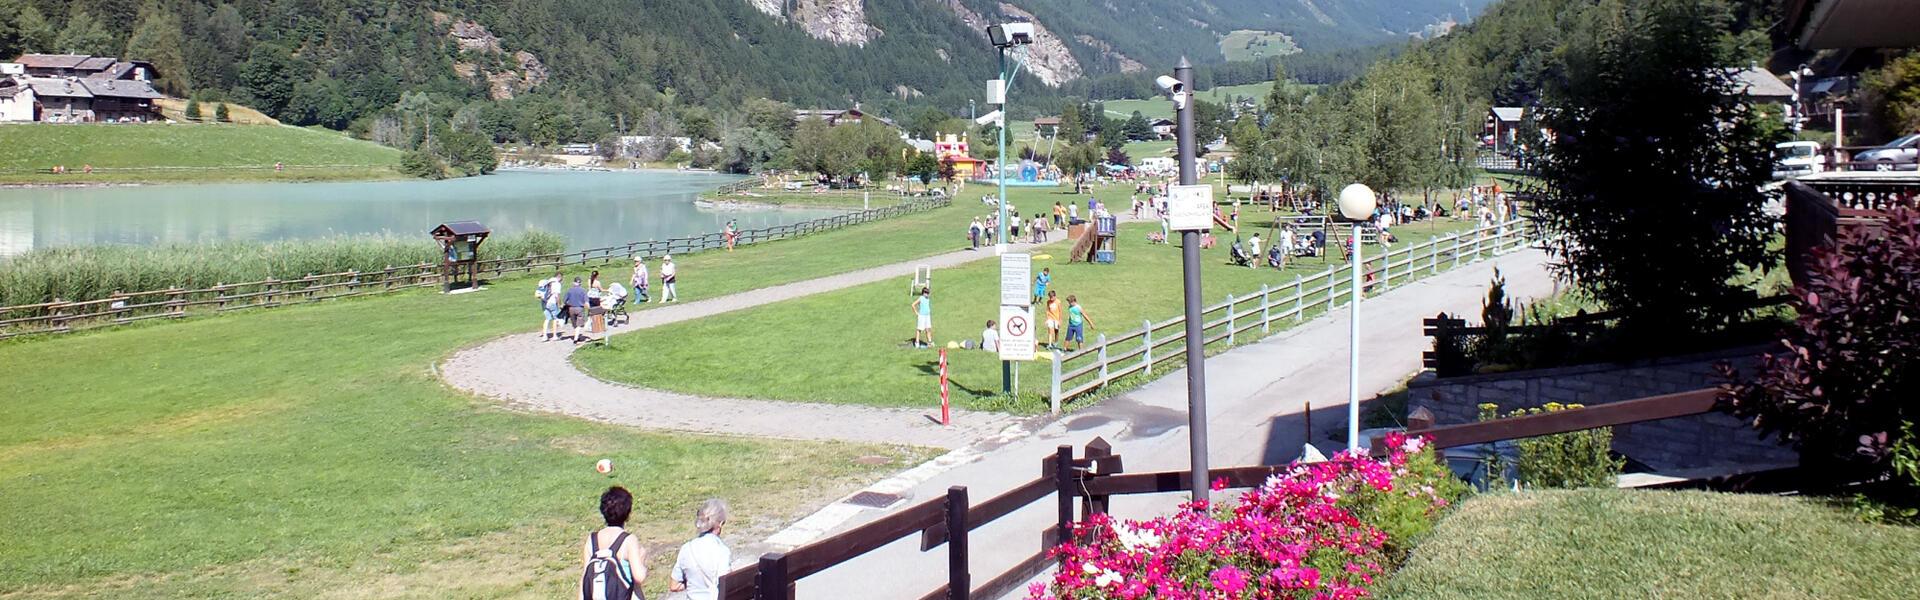 Offerta di Agosto B&B in Val d'Ayas